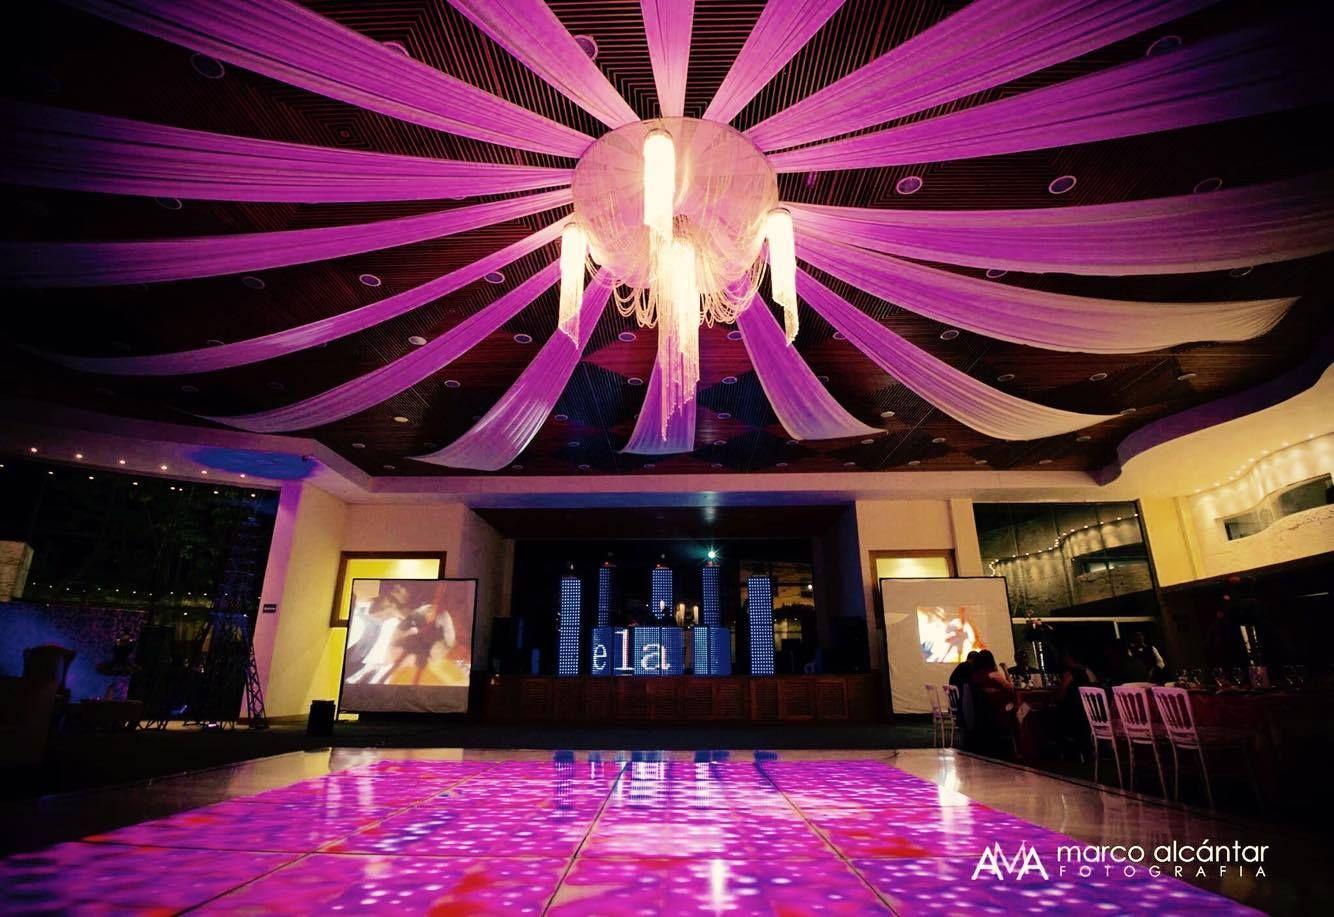 decoracion de salones para fiestas pistas de baile de leds en acrilico diseo xpoo music